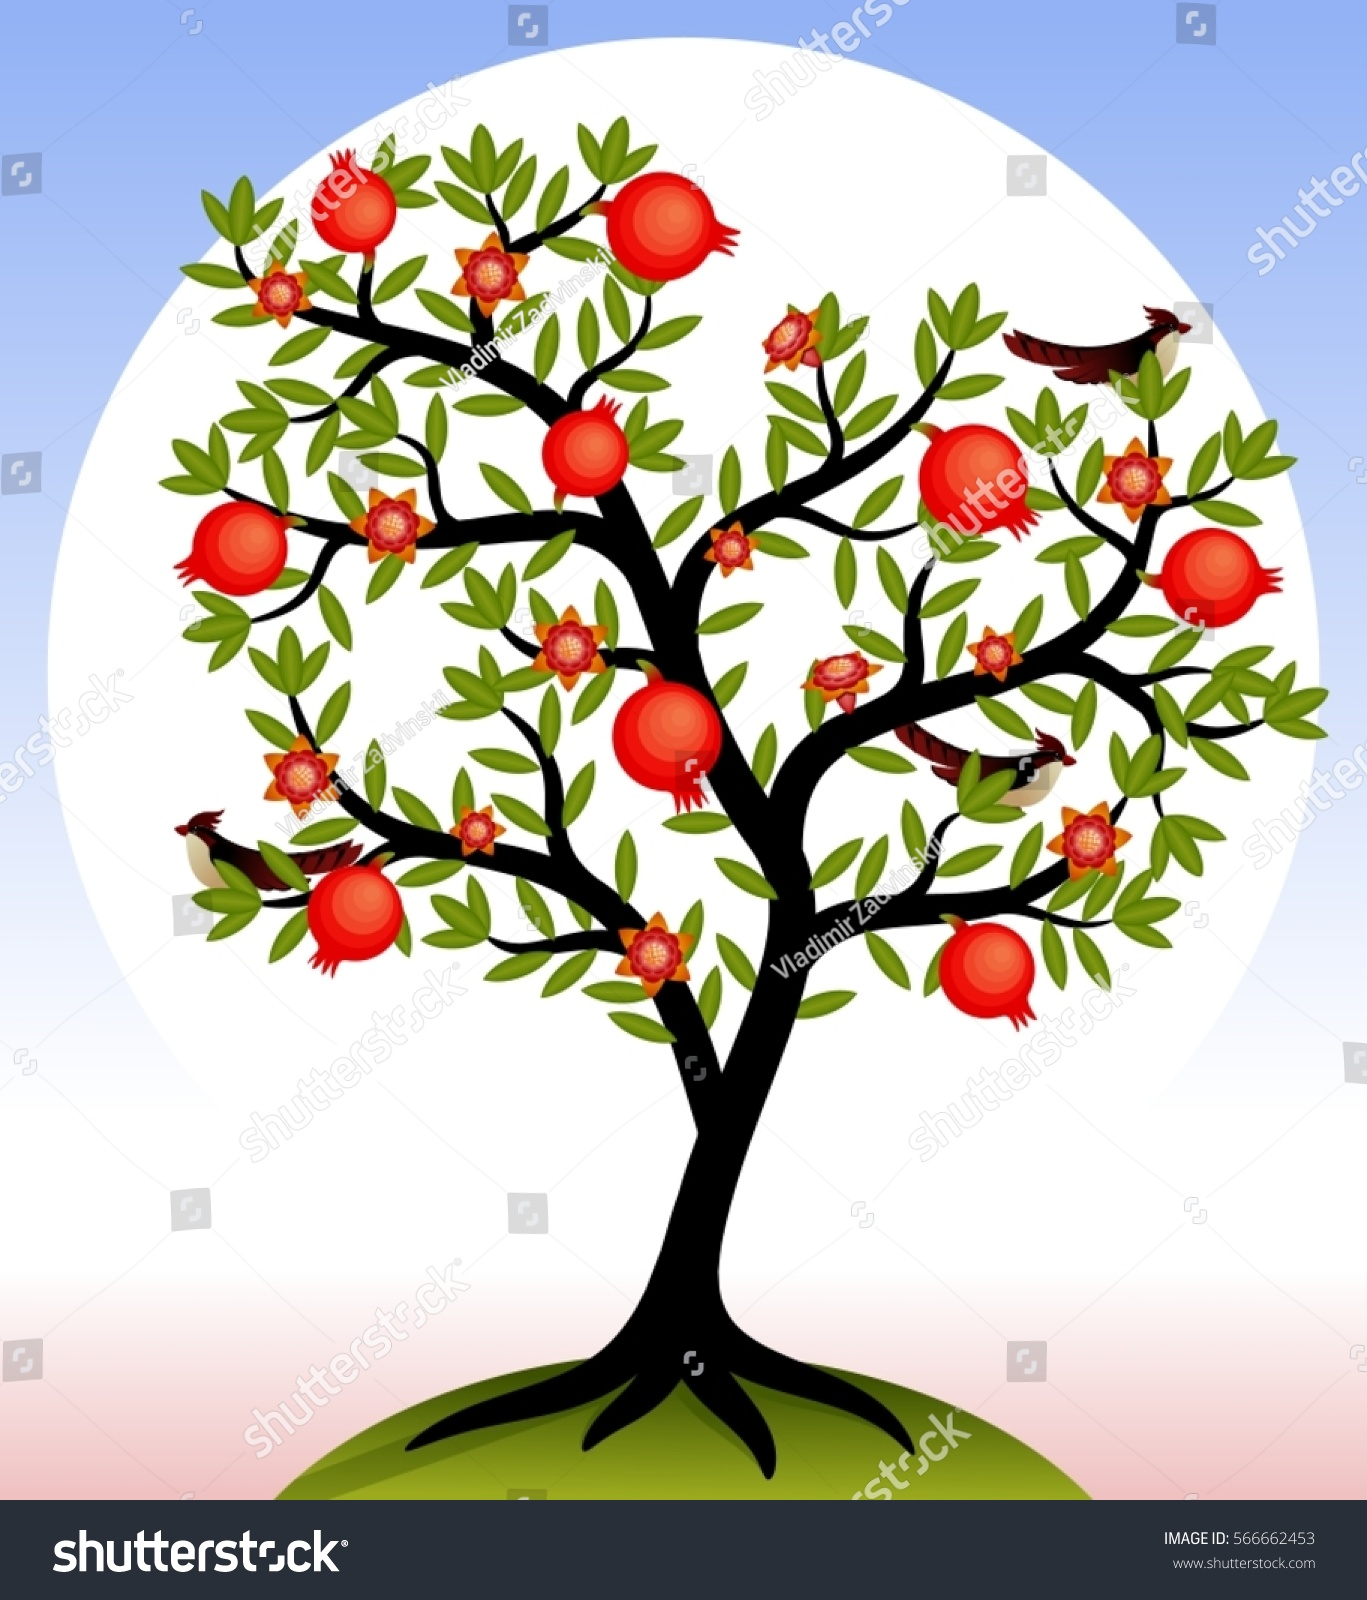 Fruit Tree Pomegranate Tree Fruits Flowers Stock Vector ...